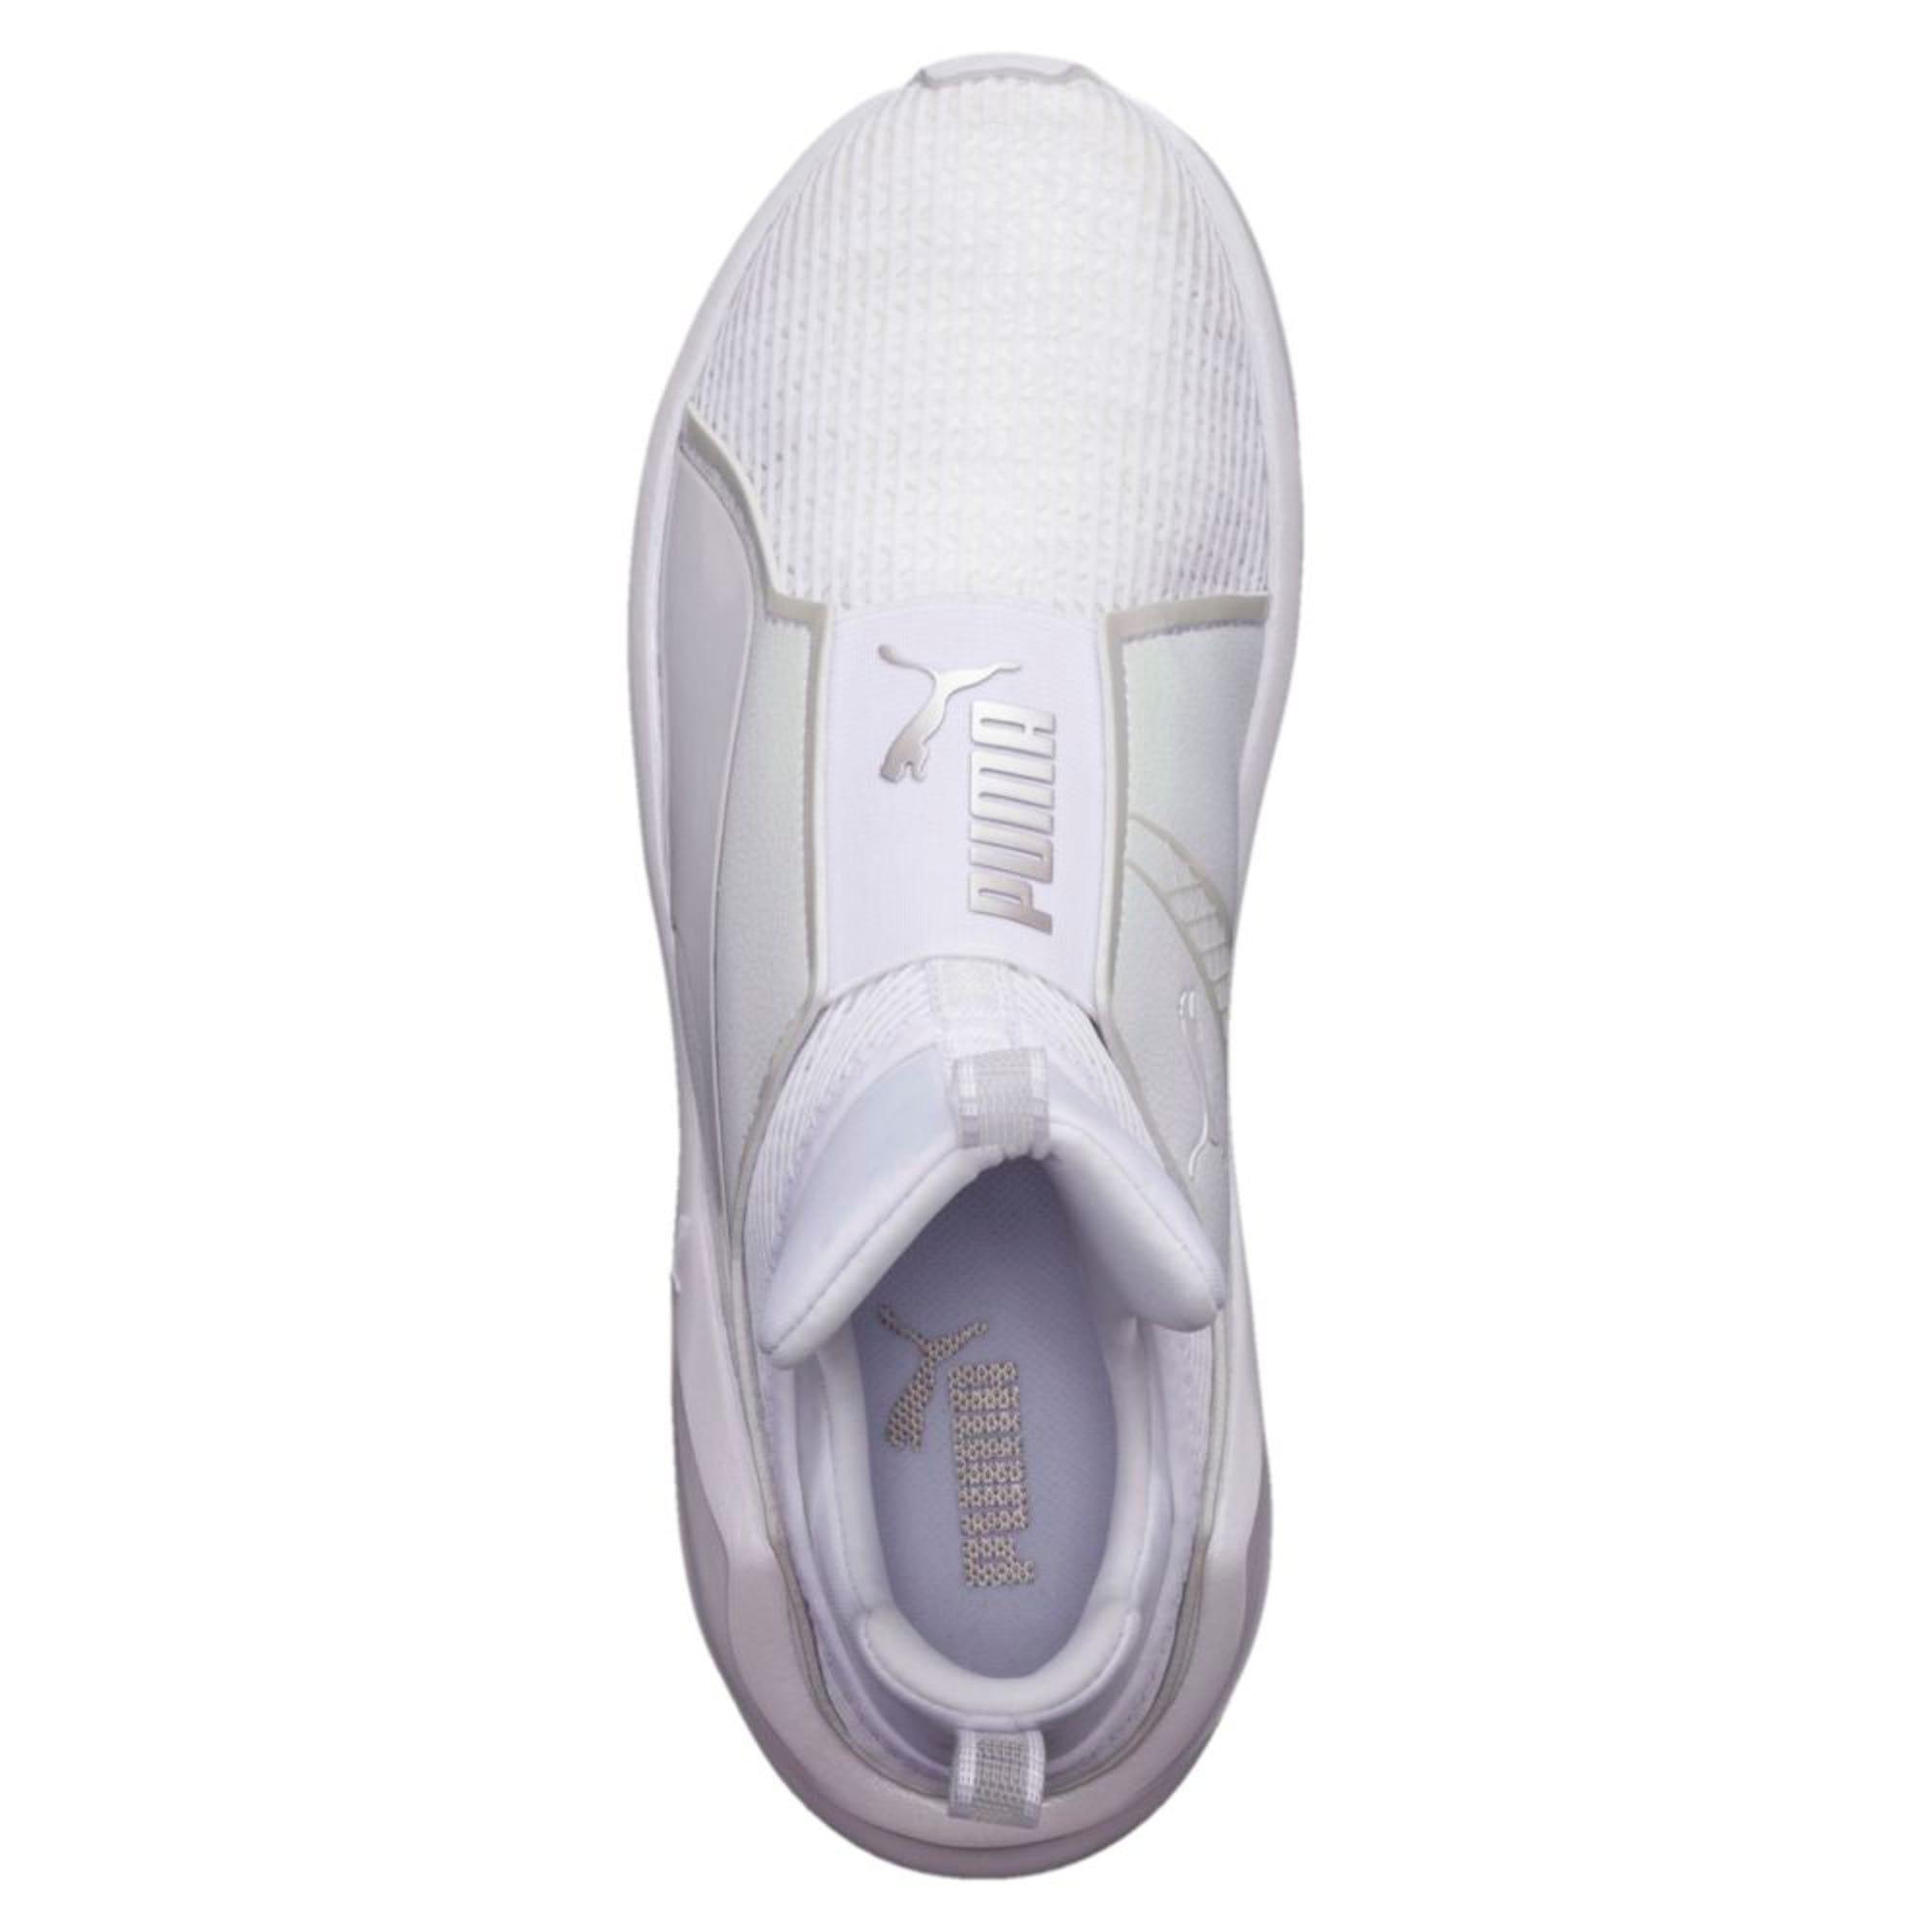 Thumbnail 5 of Fierce En Pointe Women's Training Shoes, Puma White-Puma White, medium-IND